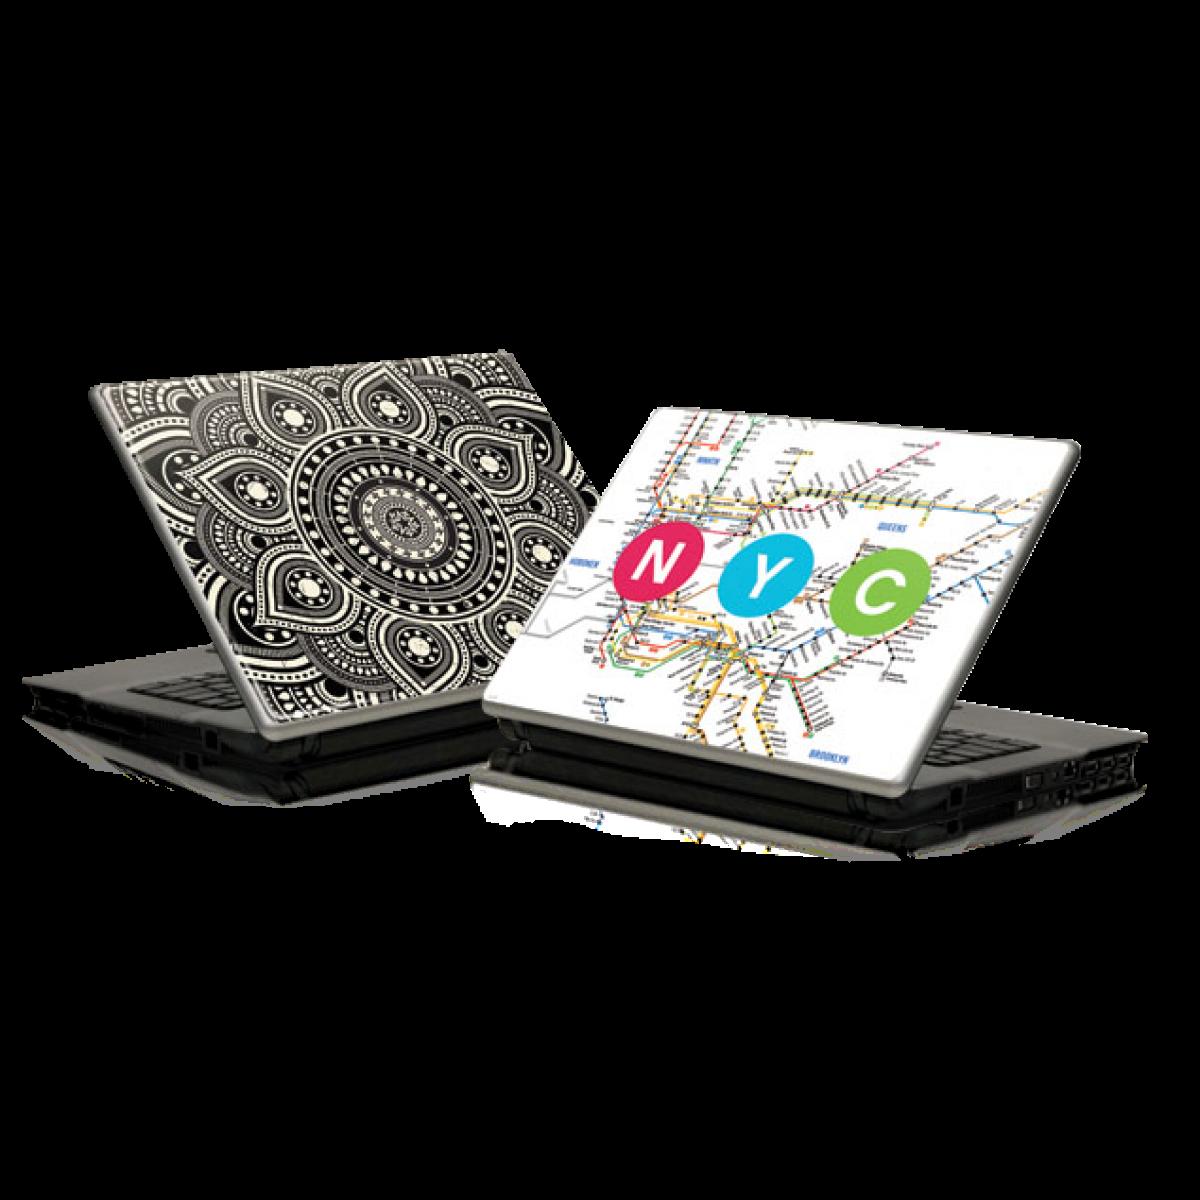 Semakin hari semakin maju perkembangan dunia teknologi dan perkembangannya semakin pesat Skin For Laptop | Peluang Usaha Skin Laptop